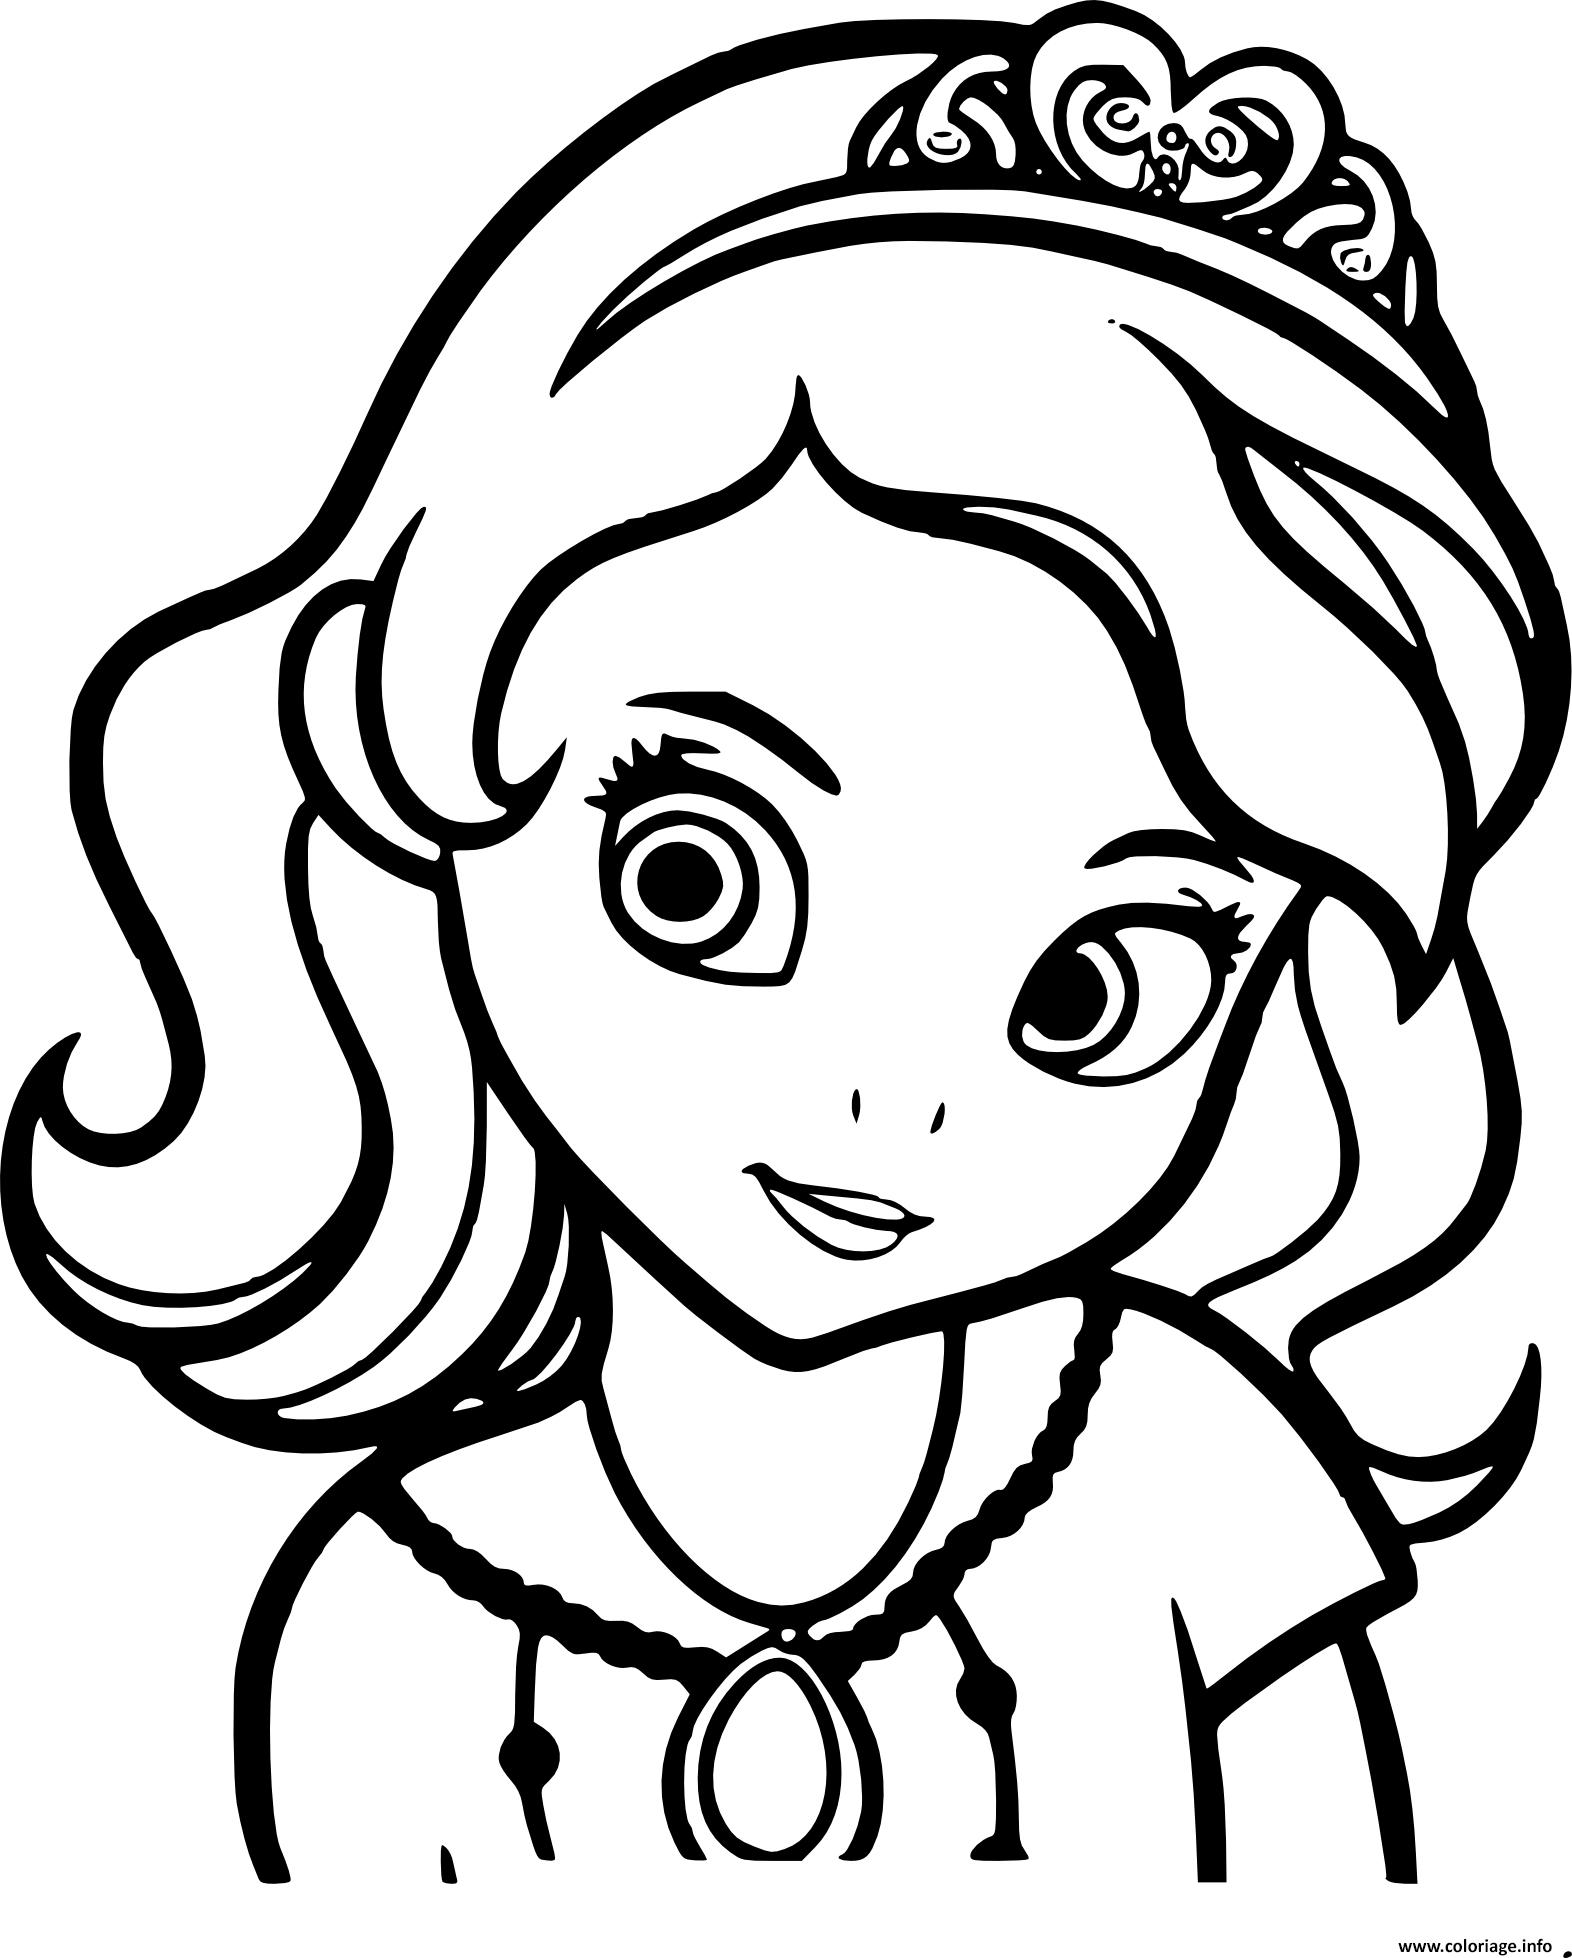 Coloriage Princesse Visage.Coloriage Princesse Sofia De Face Portrait Visage Dessin